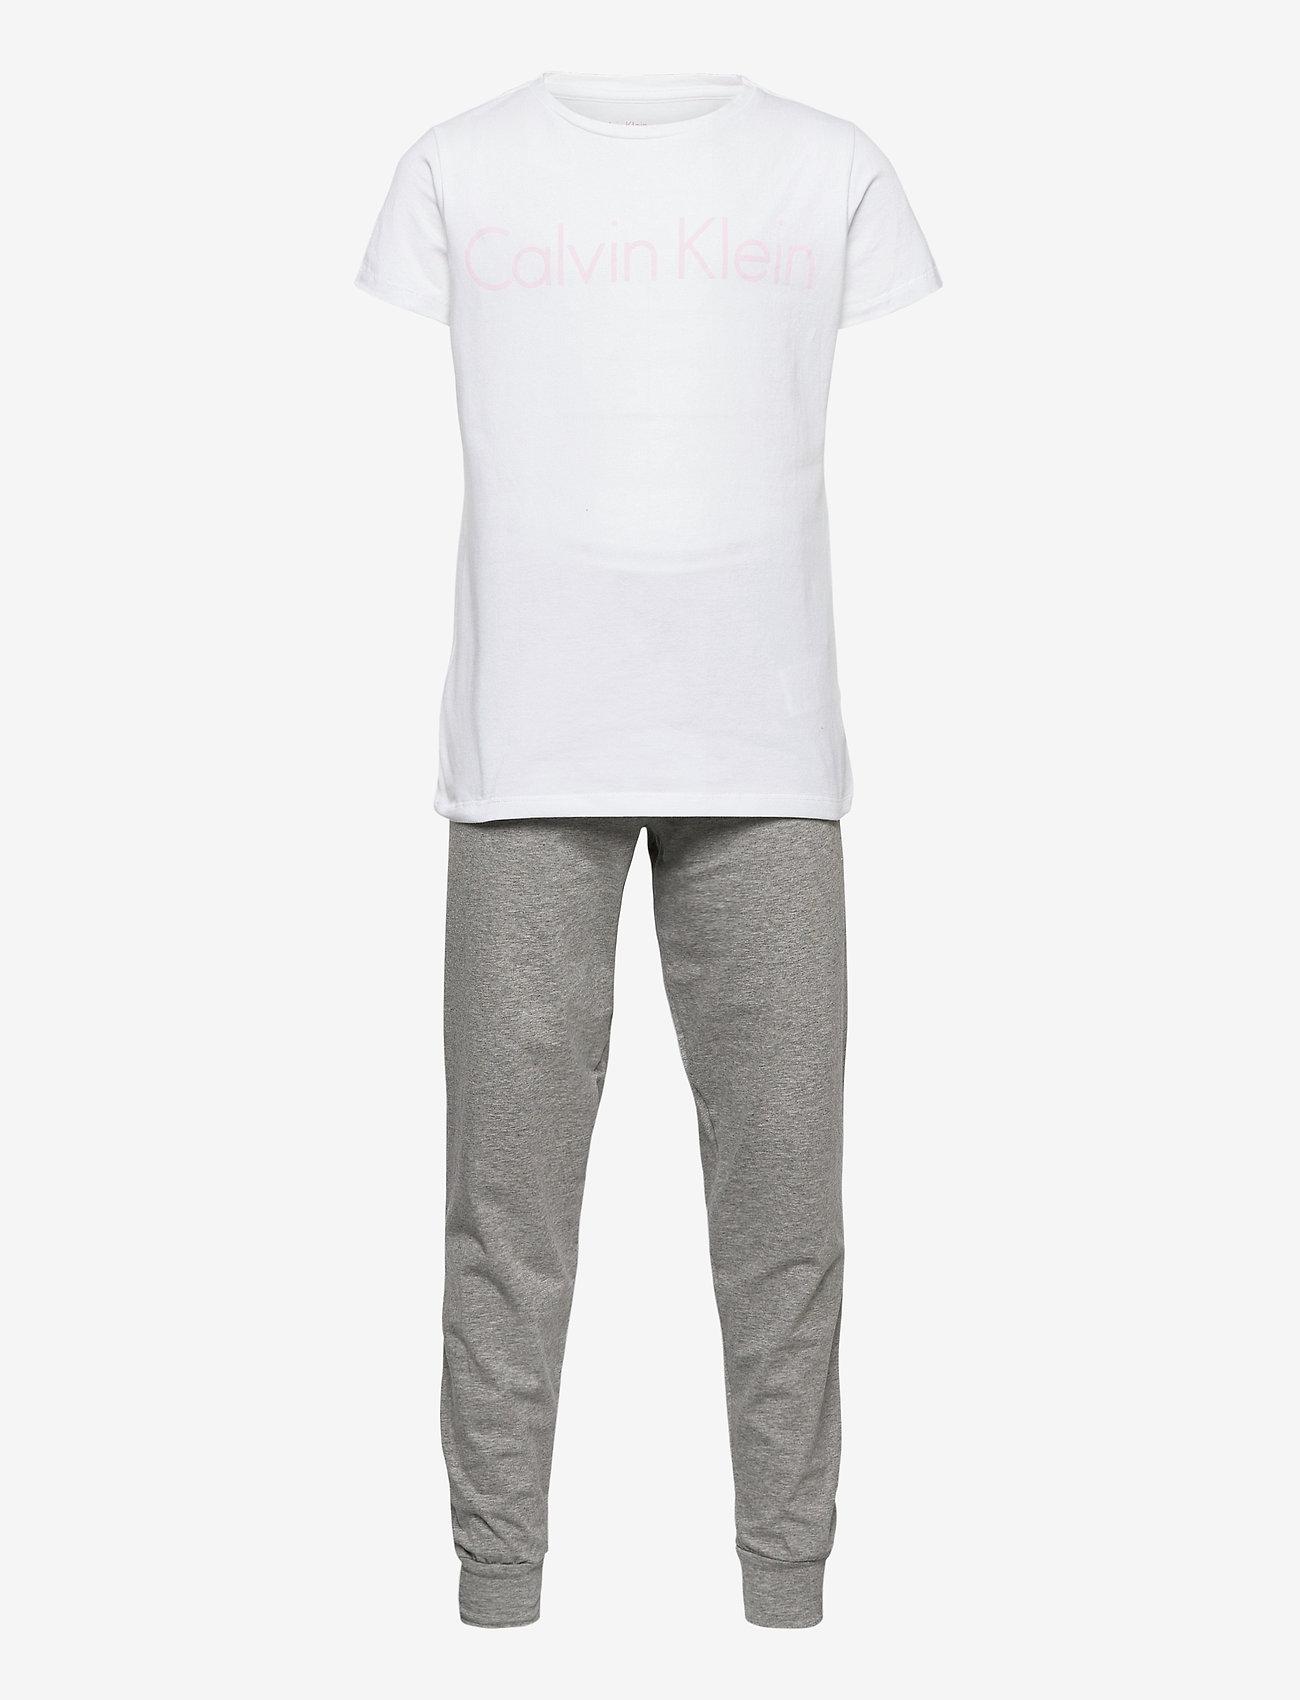 Calvin Klein - SS KNIT PJ SET - ondergoedsets - white/grey htr - 0